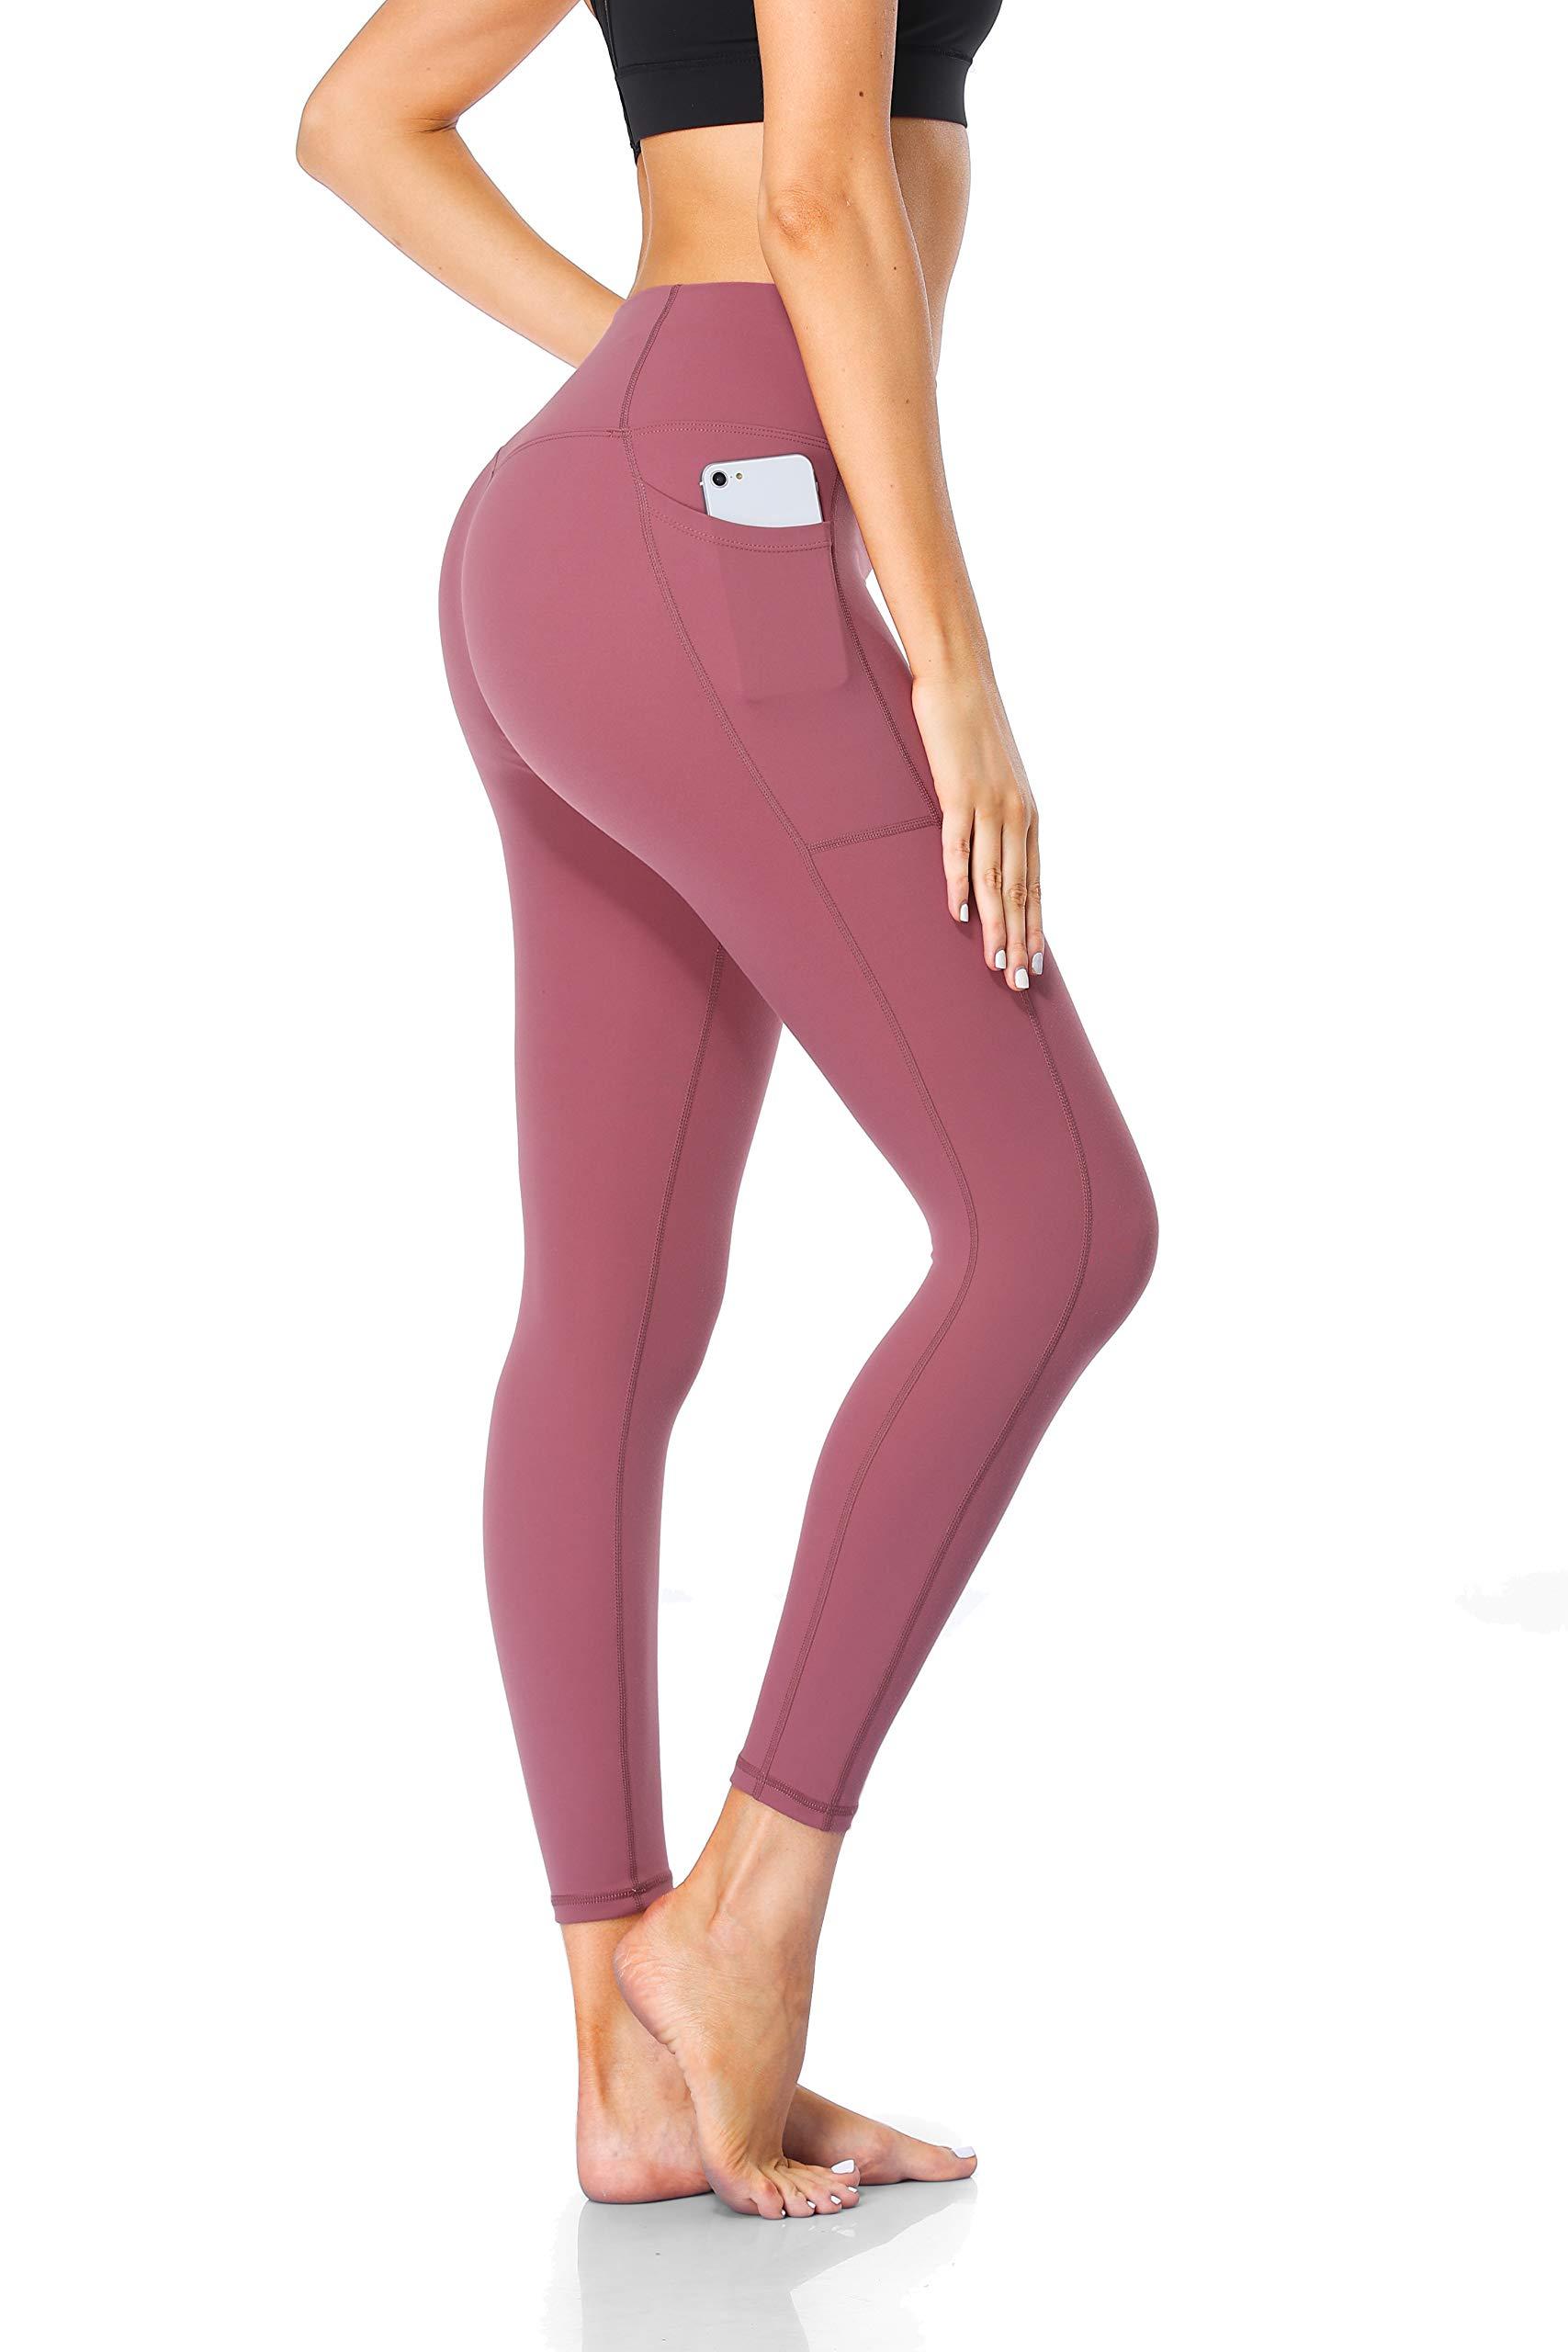 FANDIMU Women Yoga Pants with Pockets Squat Proof High Waist Tummy Control